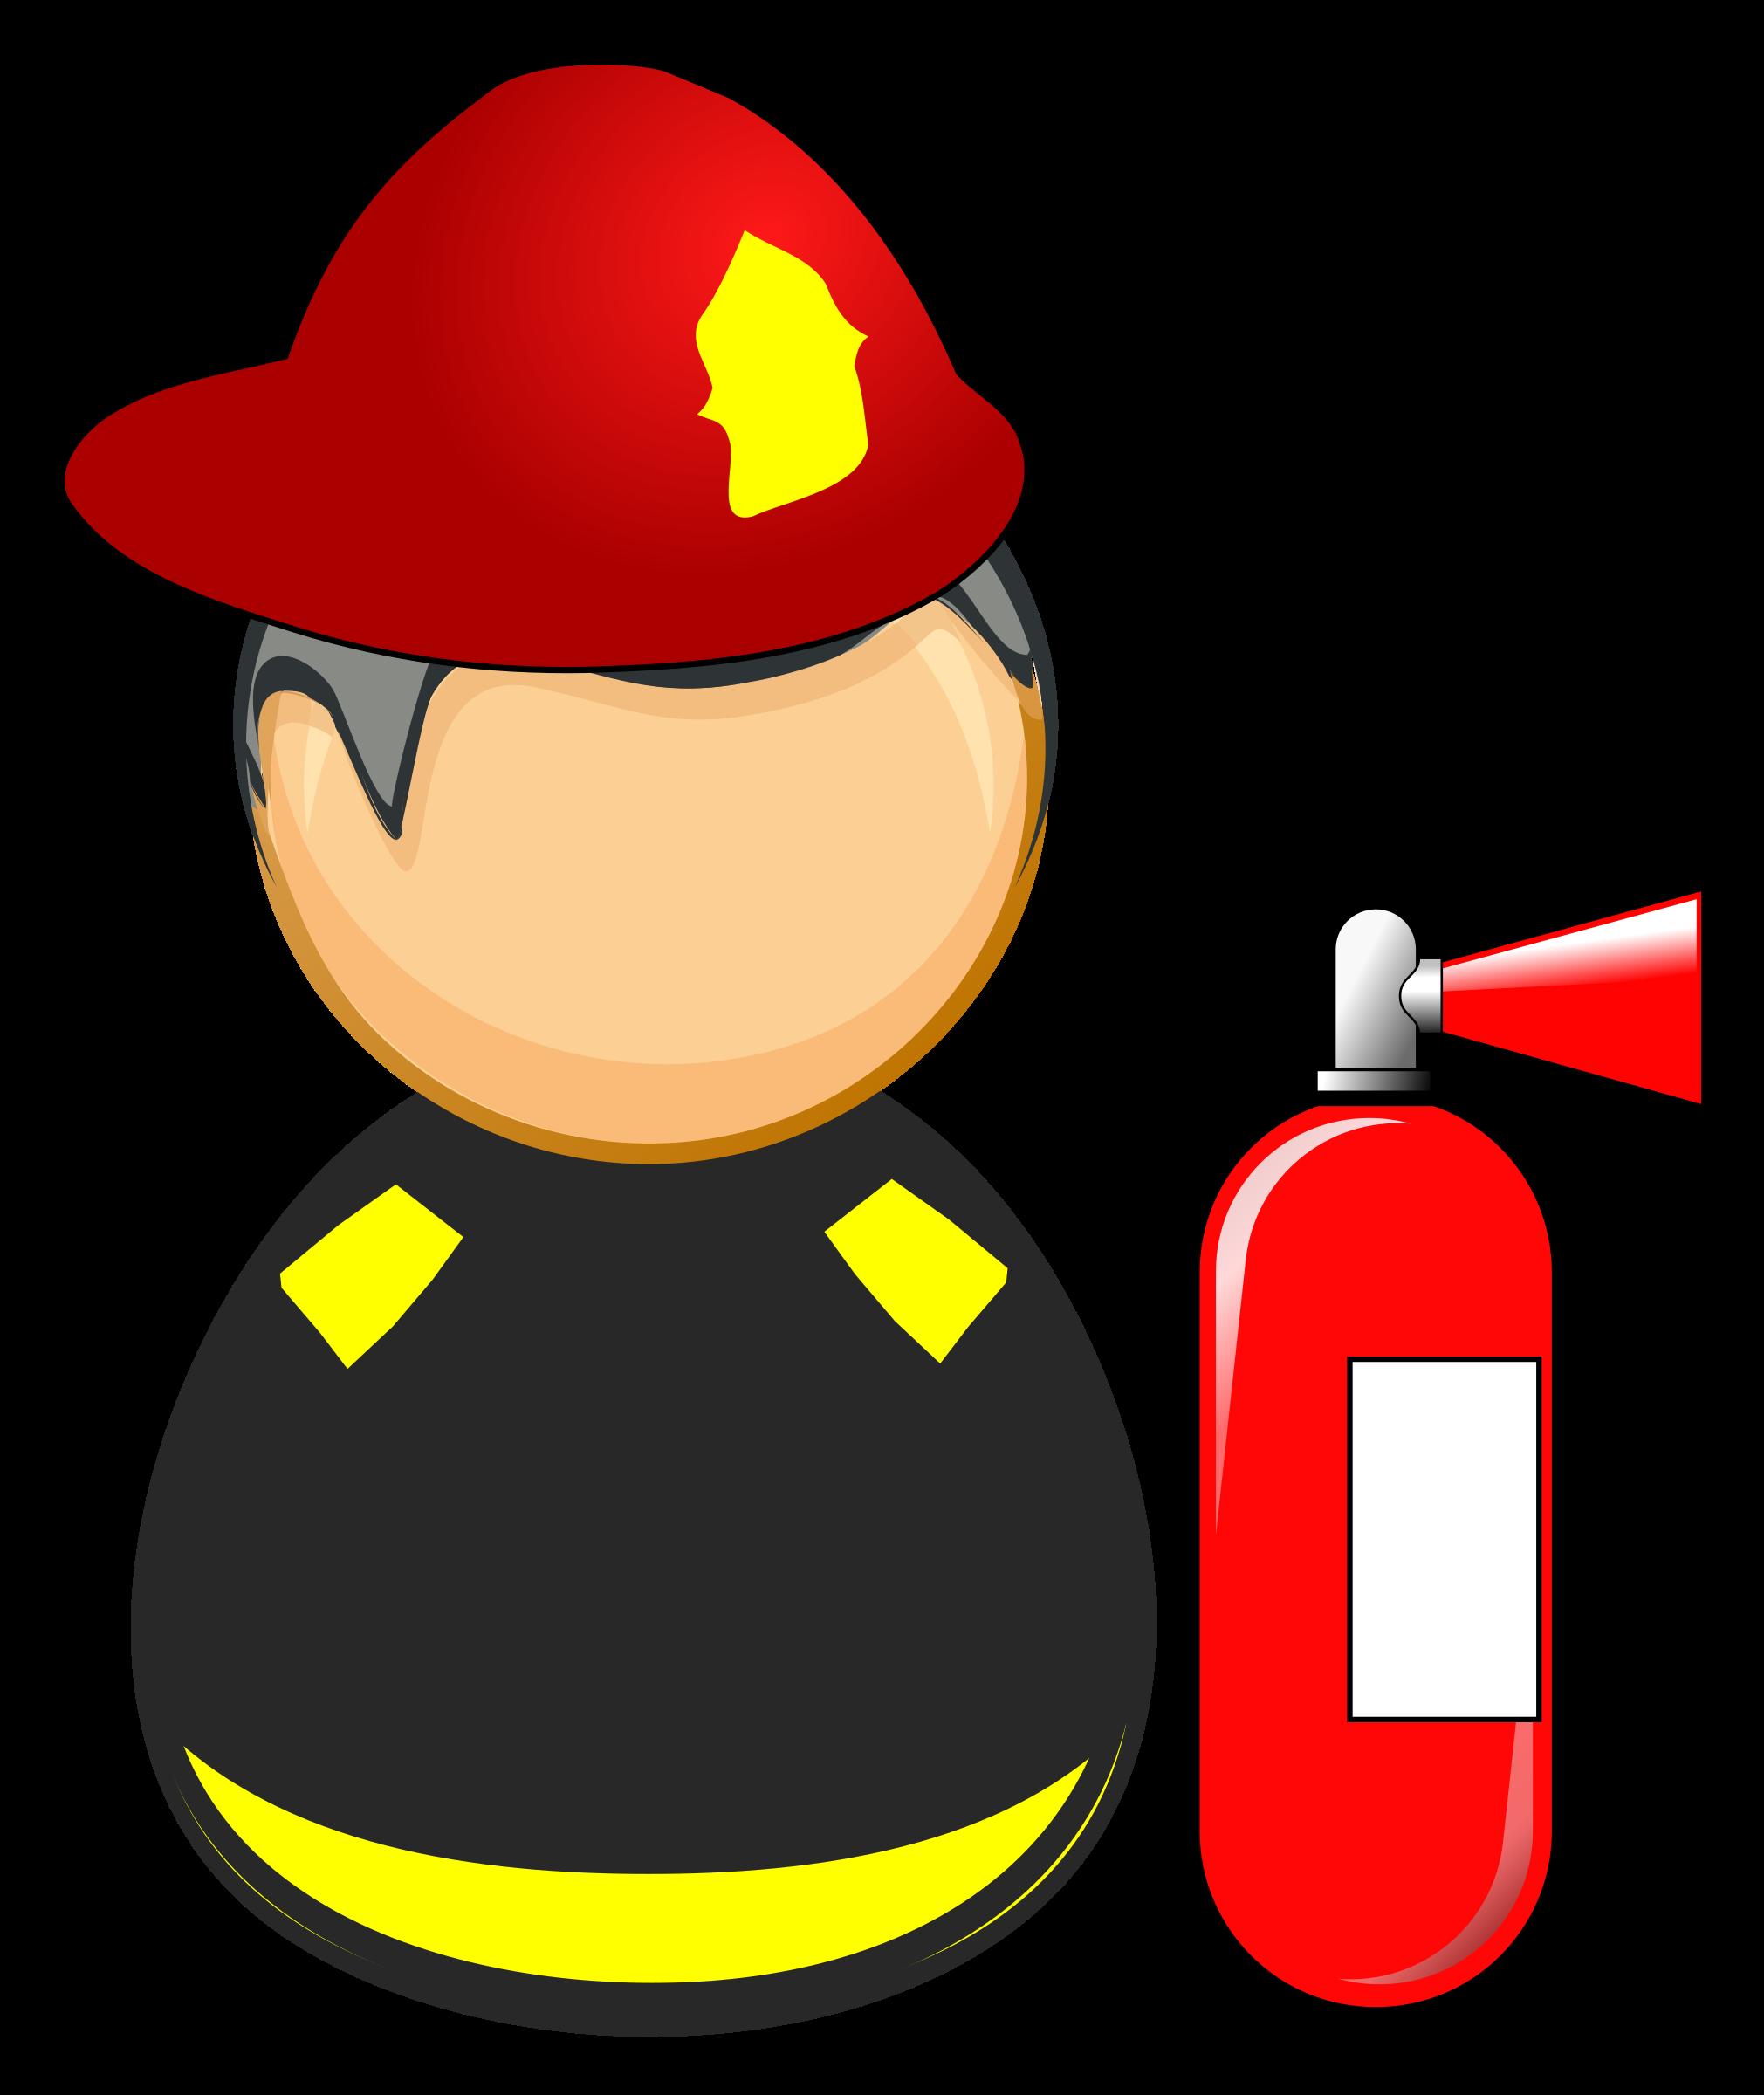 Emergency clipart emergency phone. Firefighter silhouette clip art